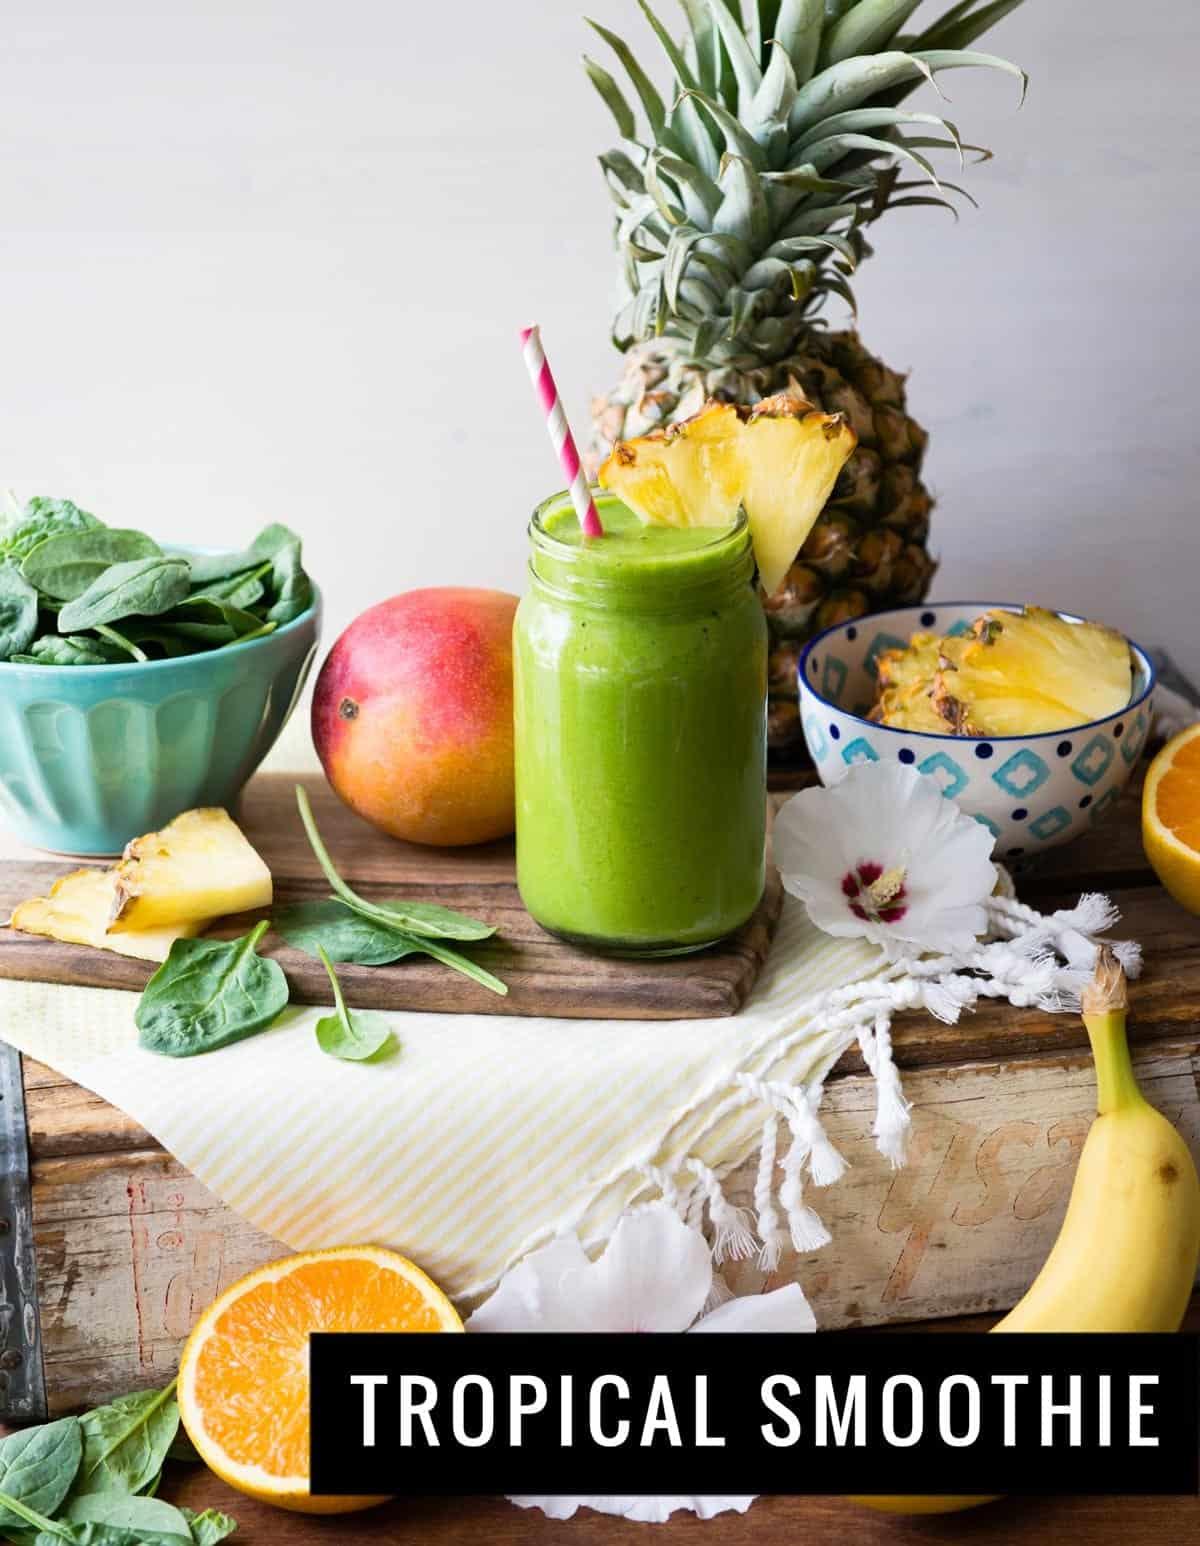 Tropical Smoothie Recipe | SimpleGreenSmoothies.com #vegan #plantbased #spinachsmoothie